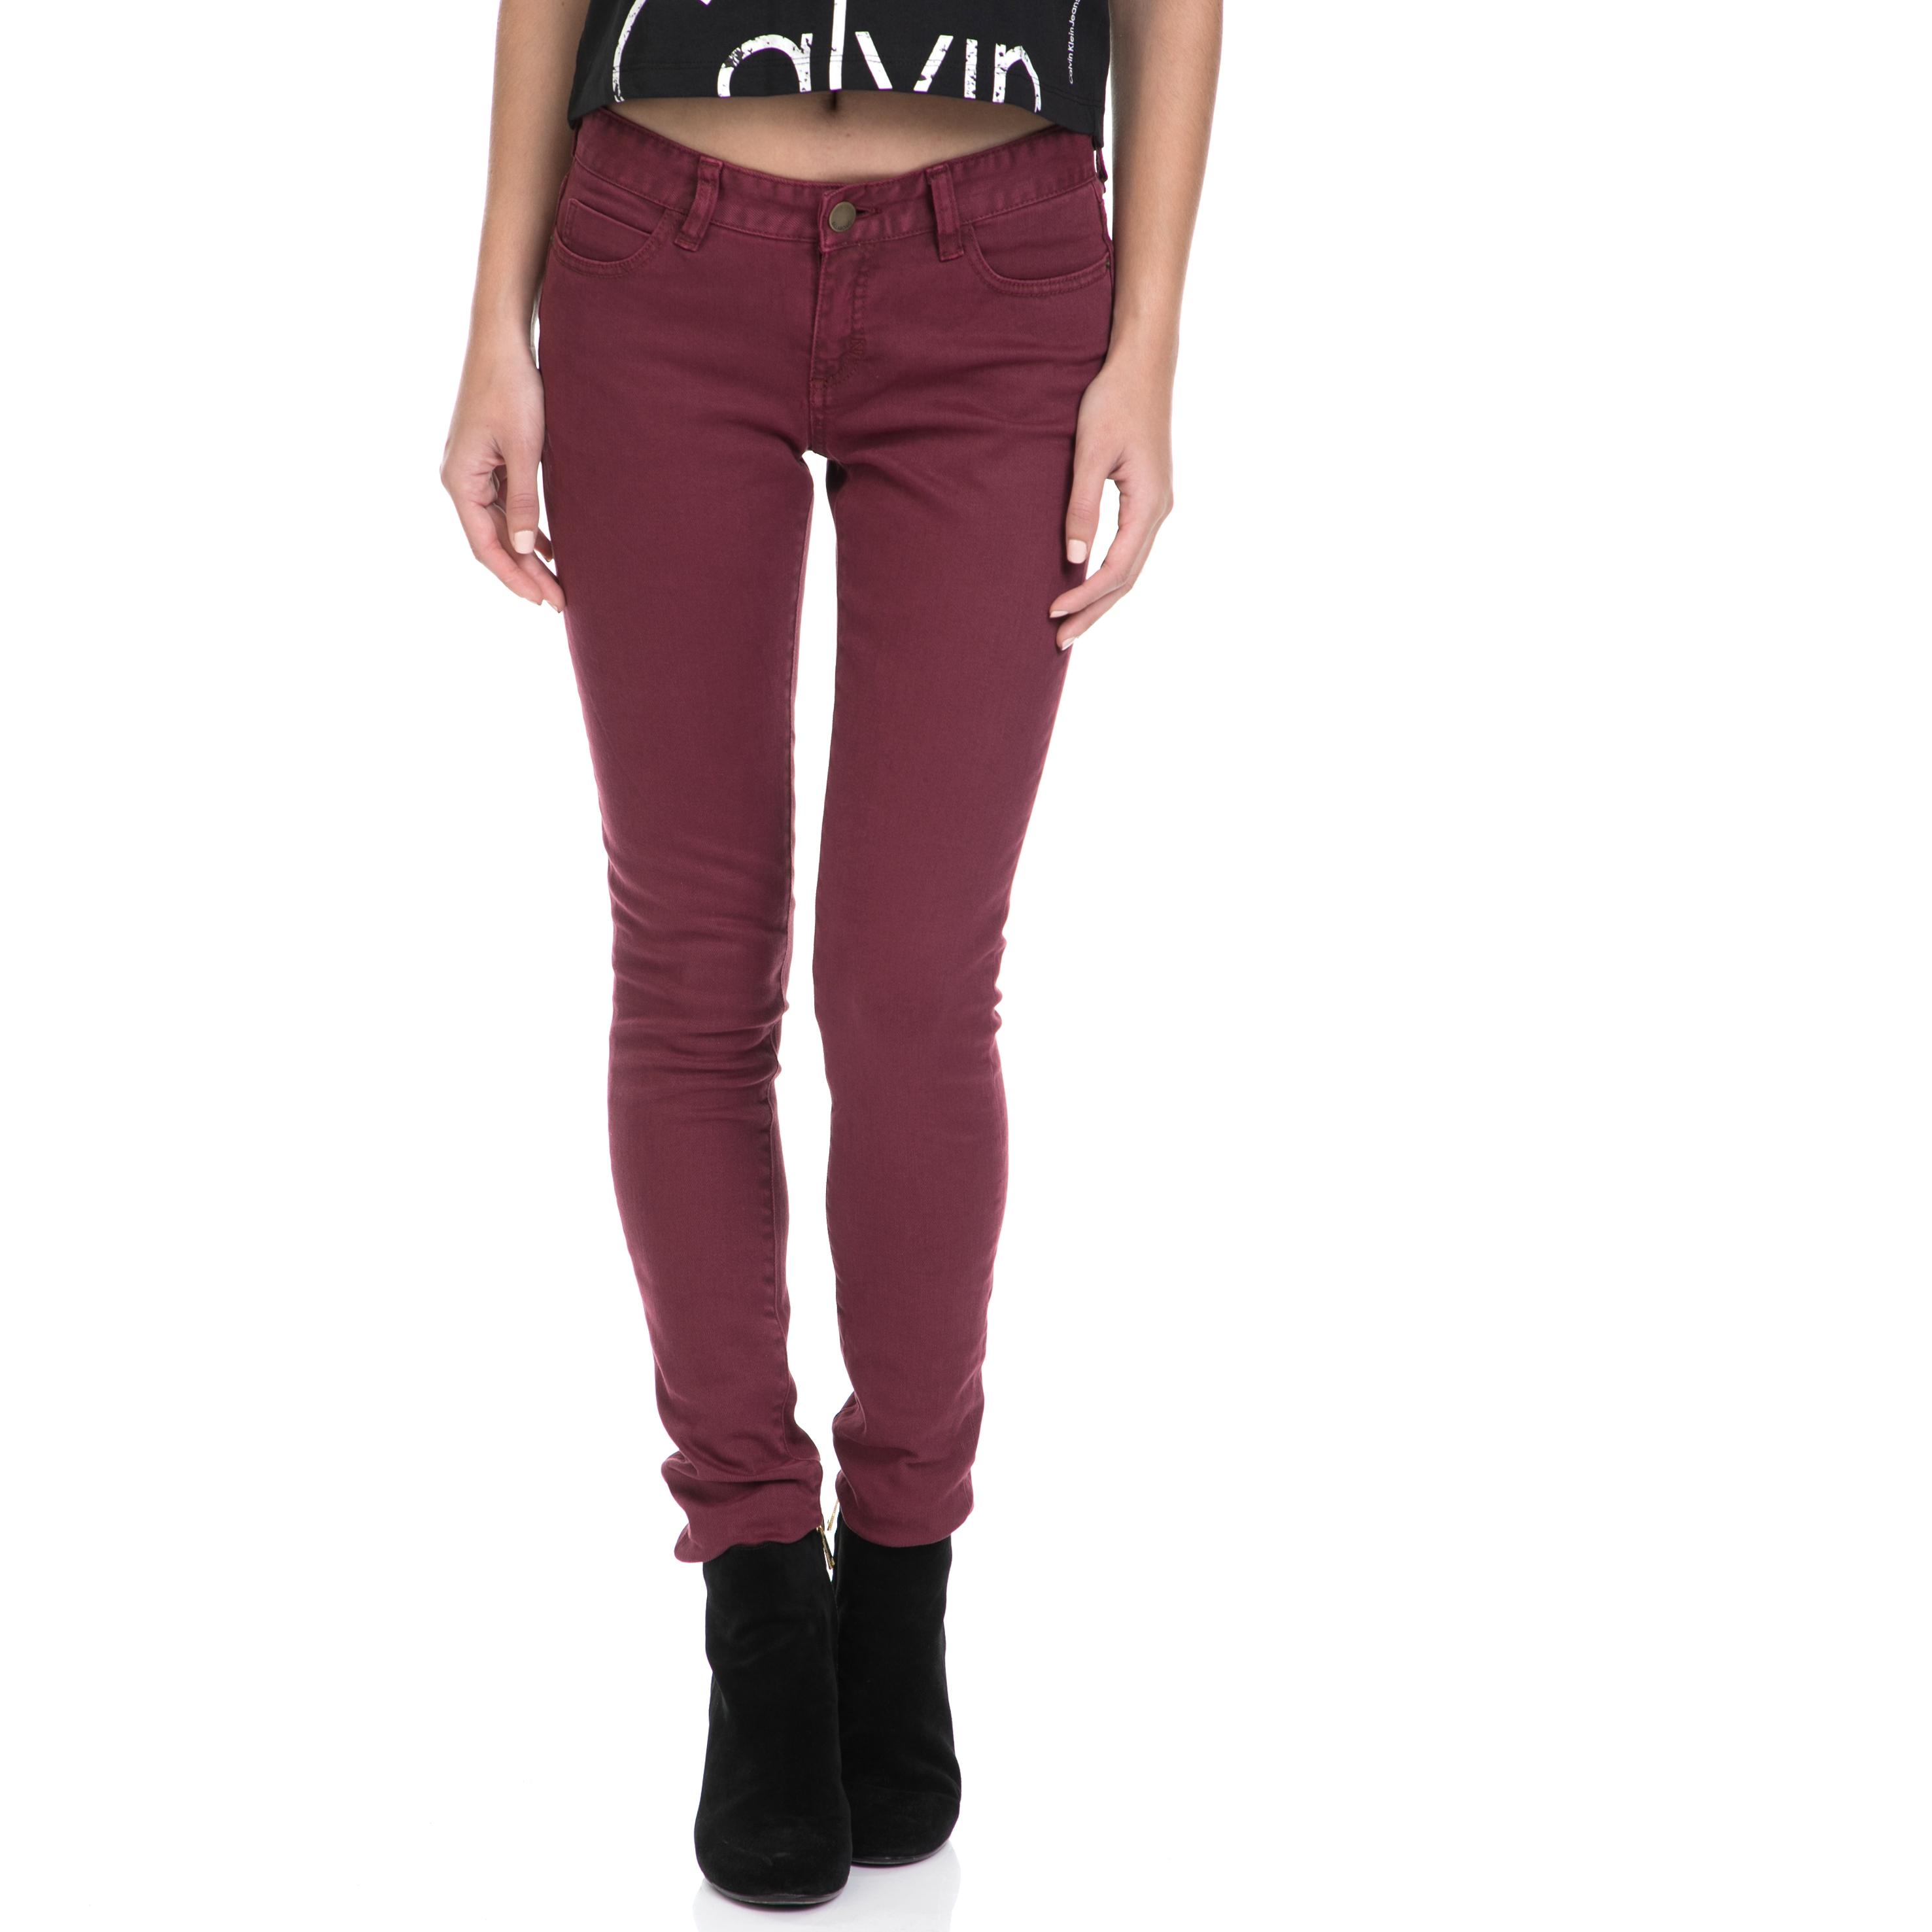 BILLABONG – Γυναικείο τζιν παντελόνι BILLABONG κόκκινο